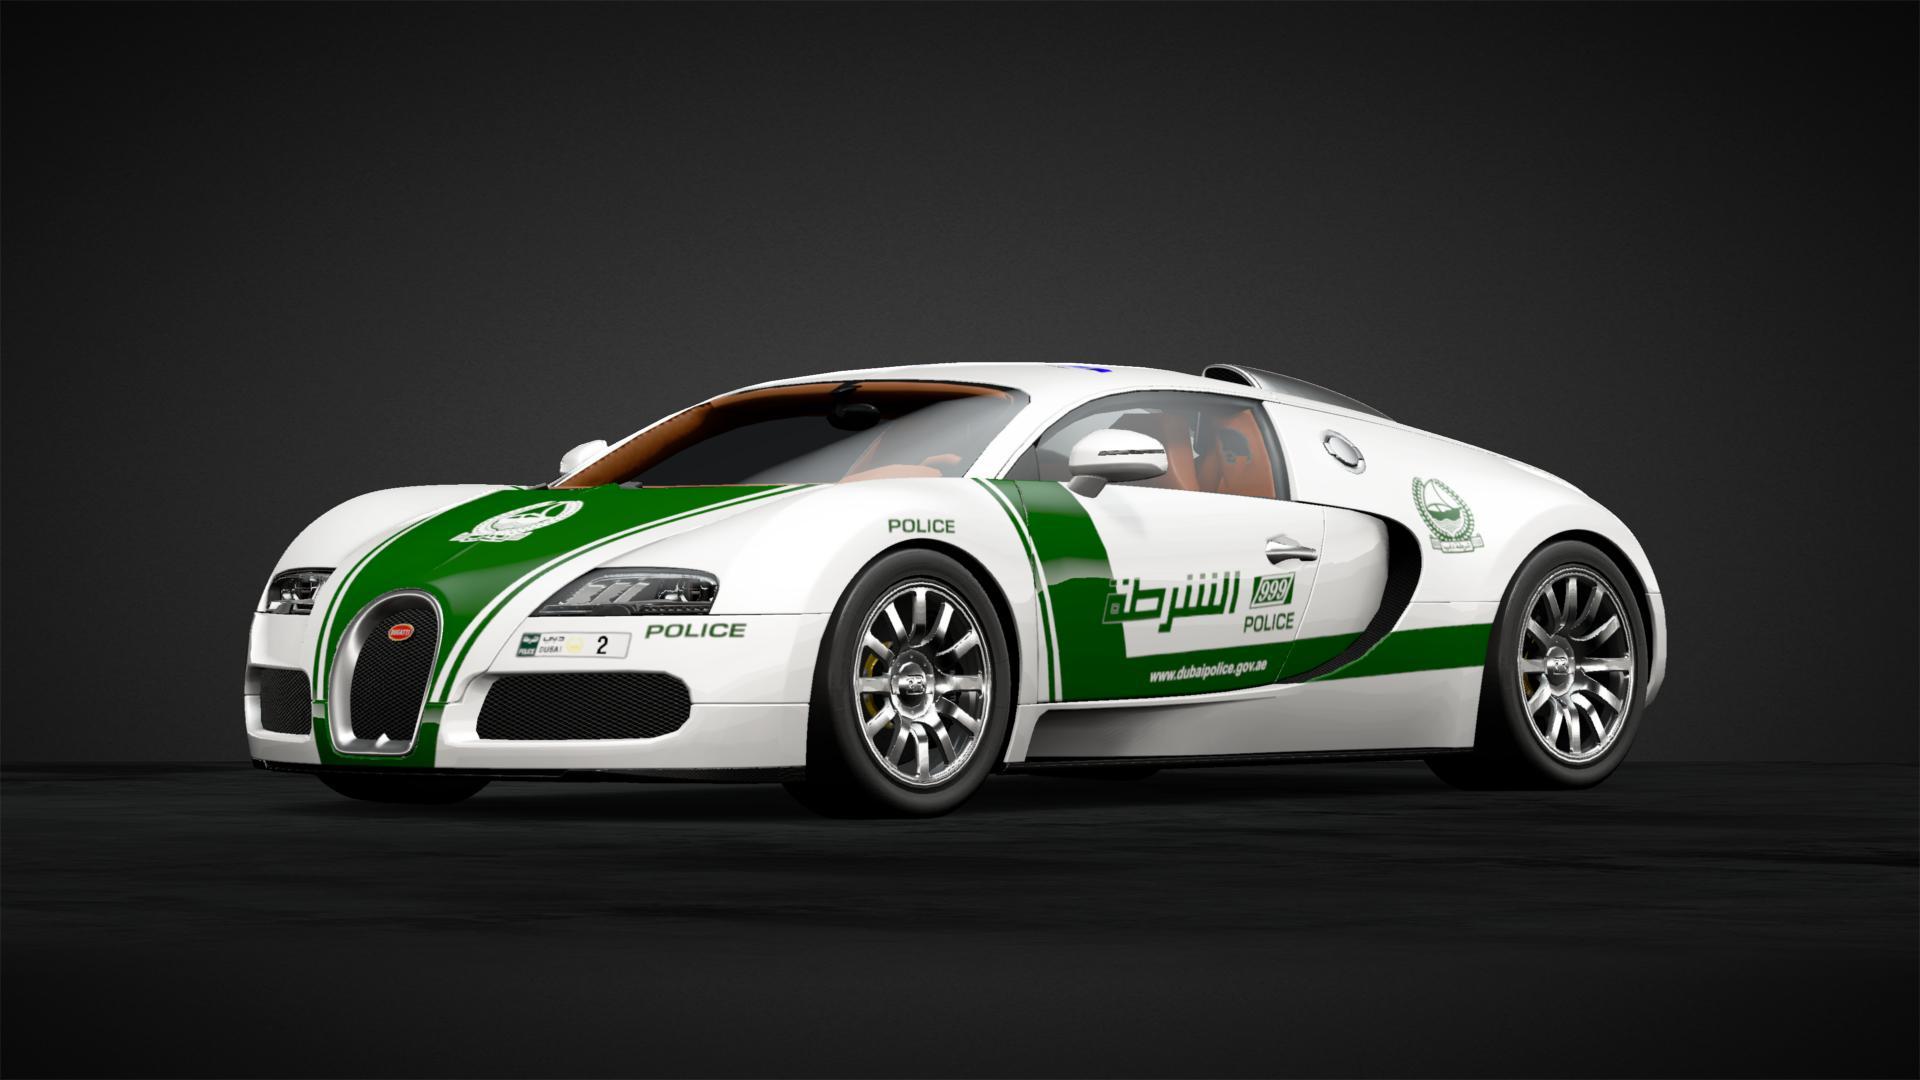 Bugatti Veyron Dubai Police Car Livery By Jak182210 Community Gran Turismo Sport